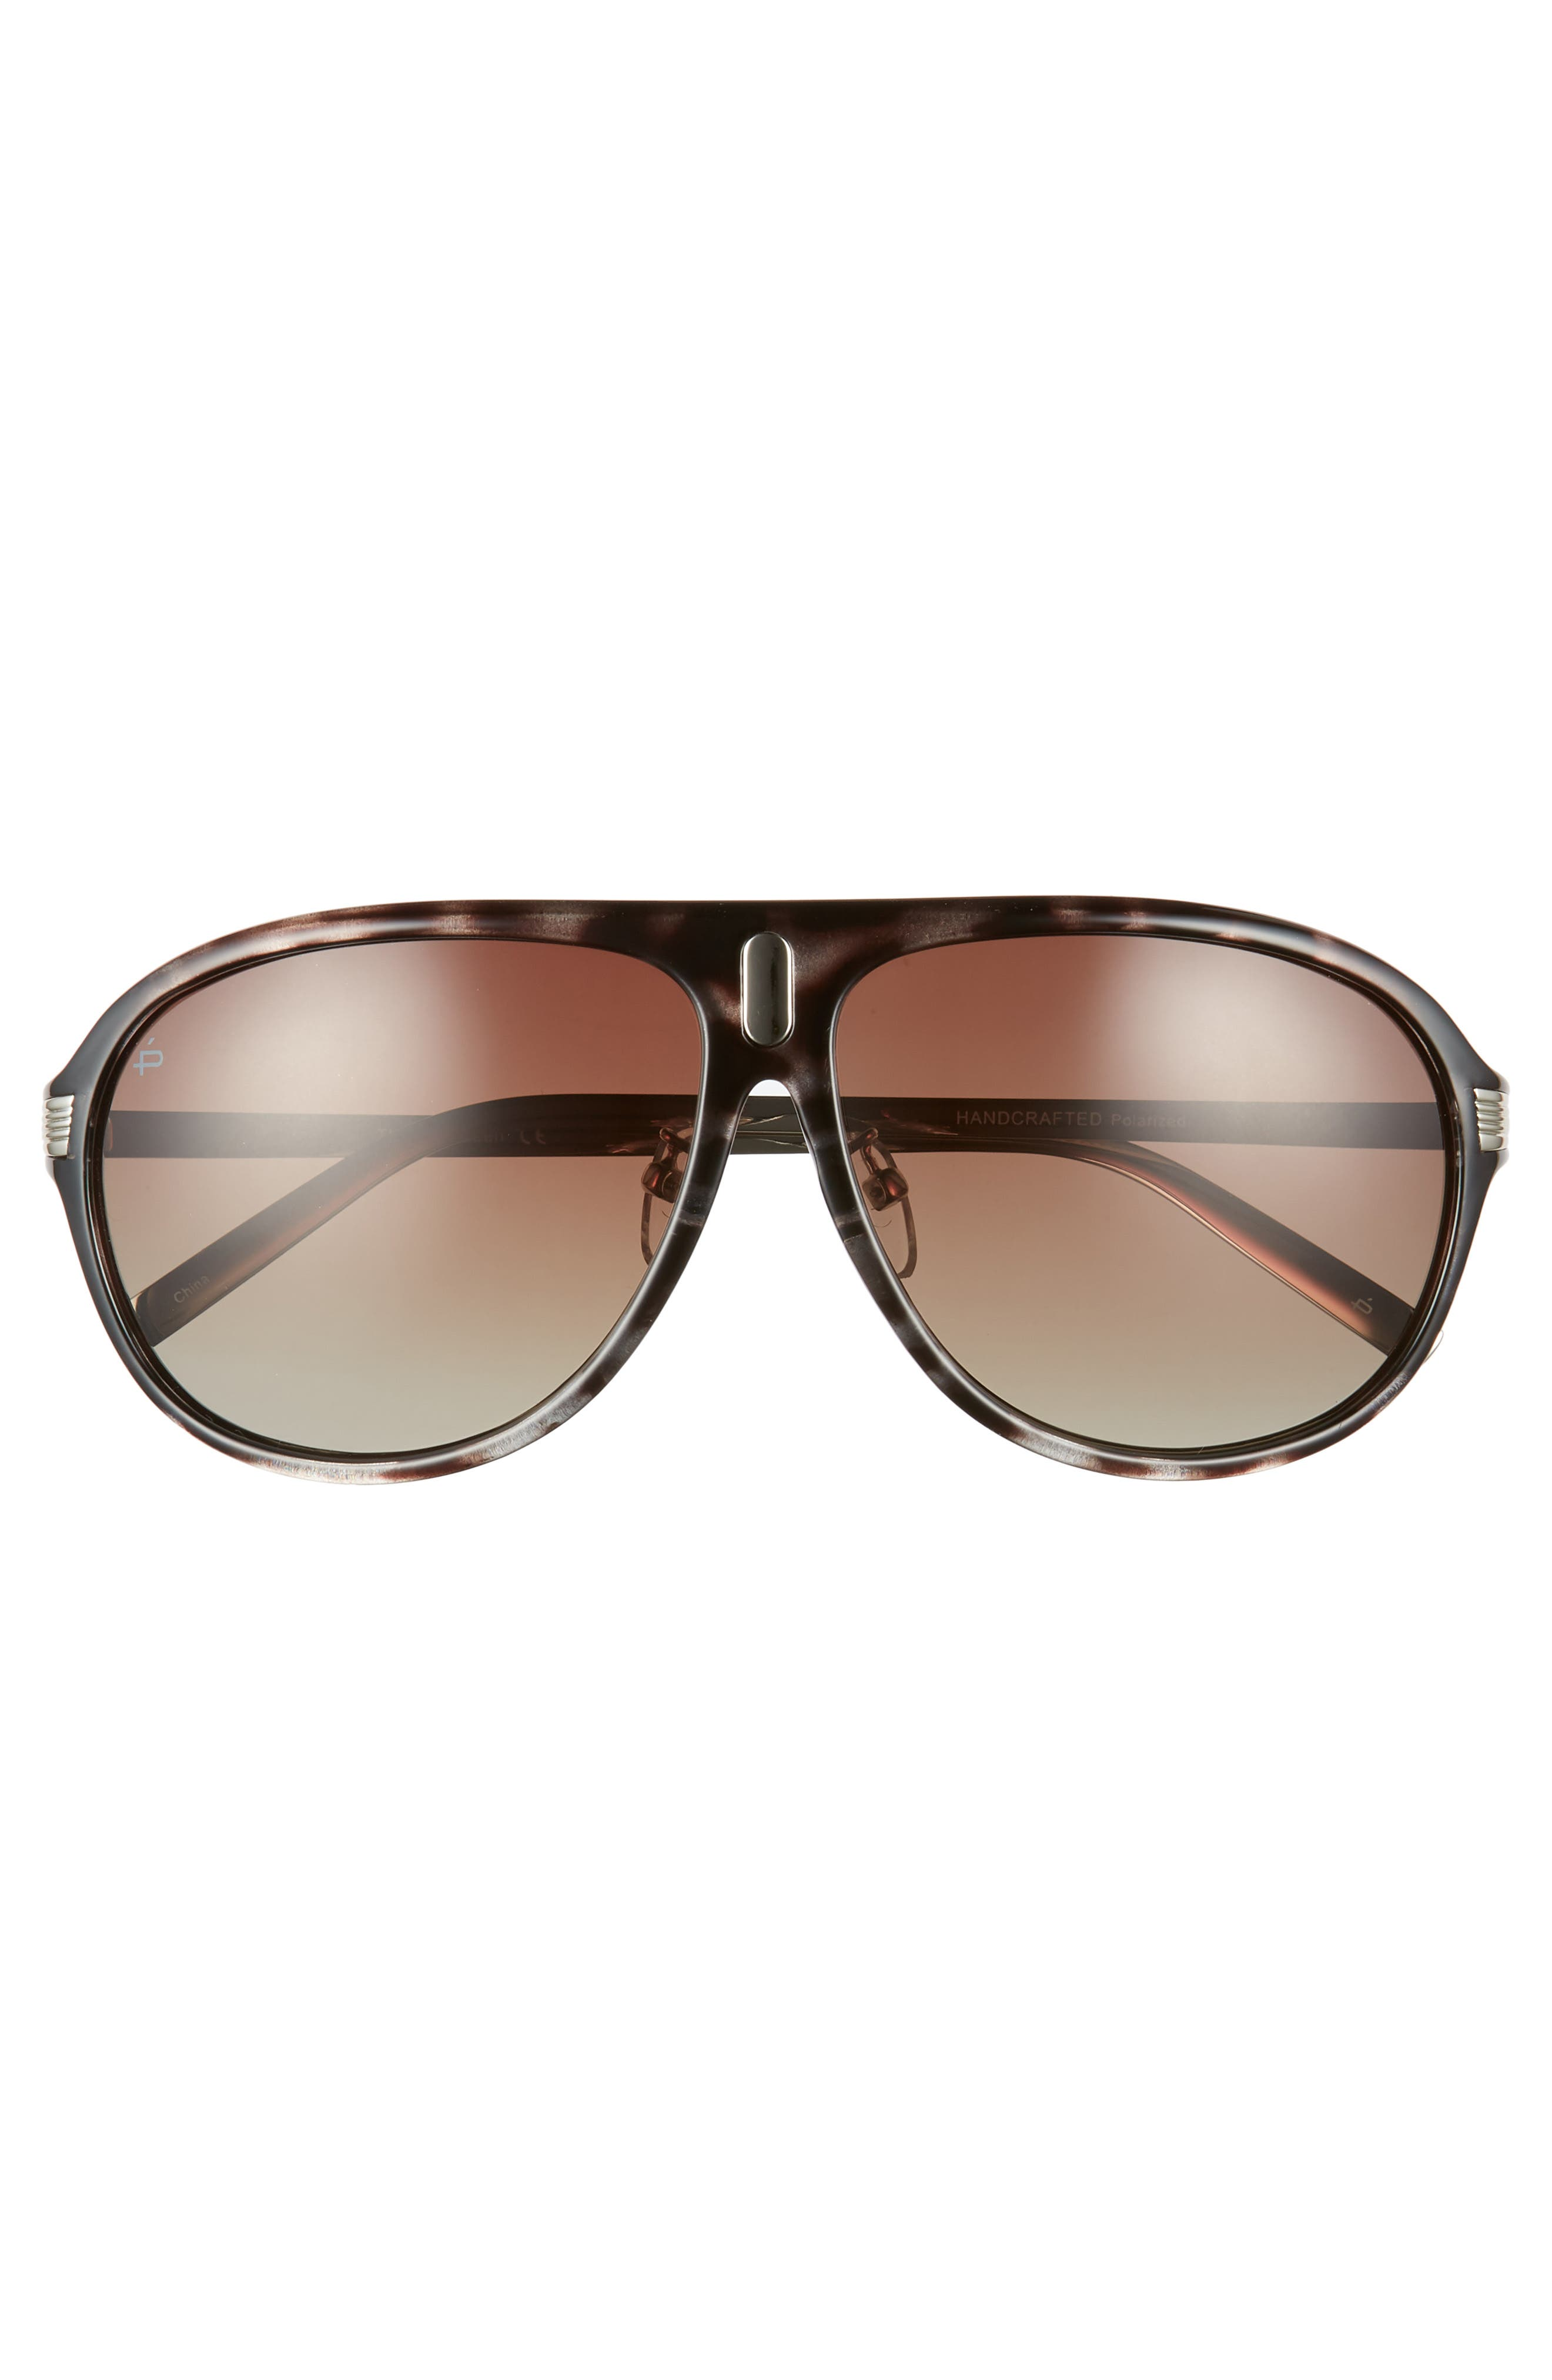 Privé Revaux The McQueen 62mm Polarized Aviator Sunglasses,                             Alternate thumbnail 2, color,                             GREY